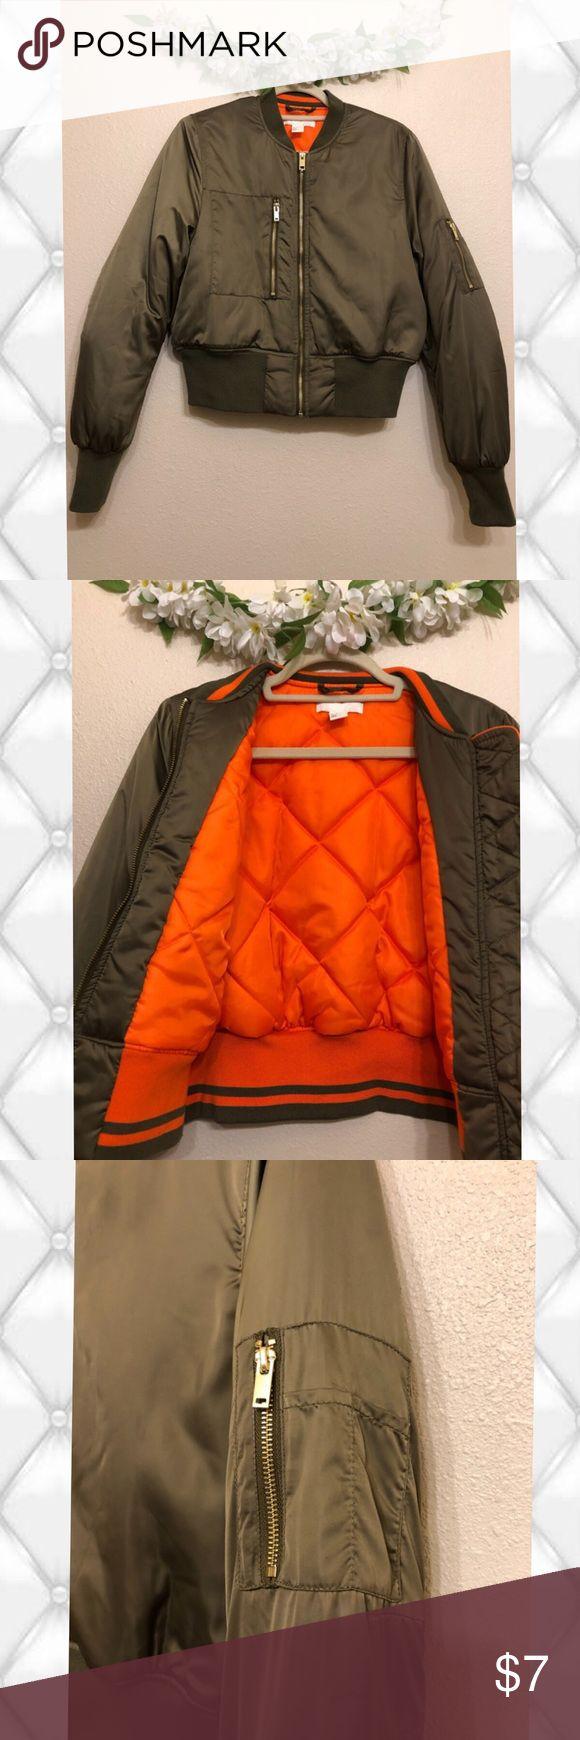 Army Green Satin Bomber Jacket Cute bomber jacket with